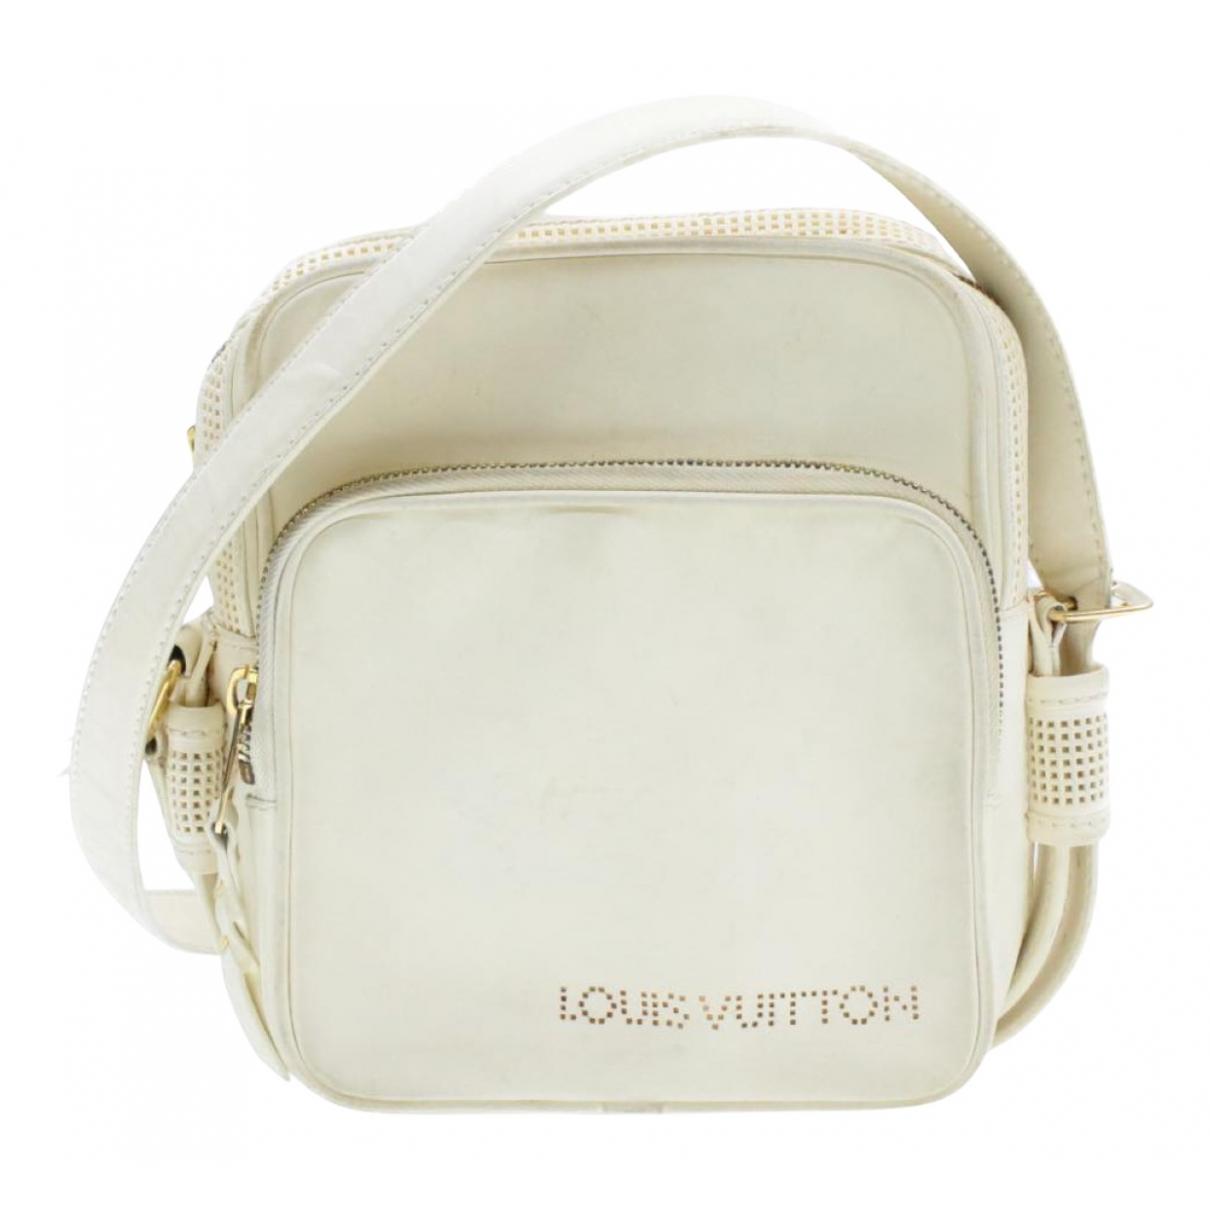 Louis Vuitton N White Leather handbag for Women N